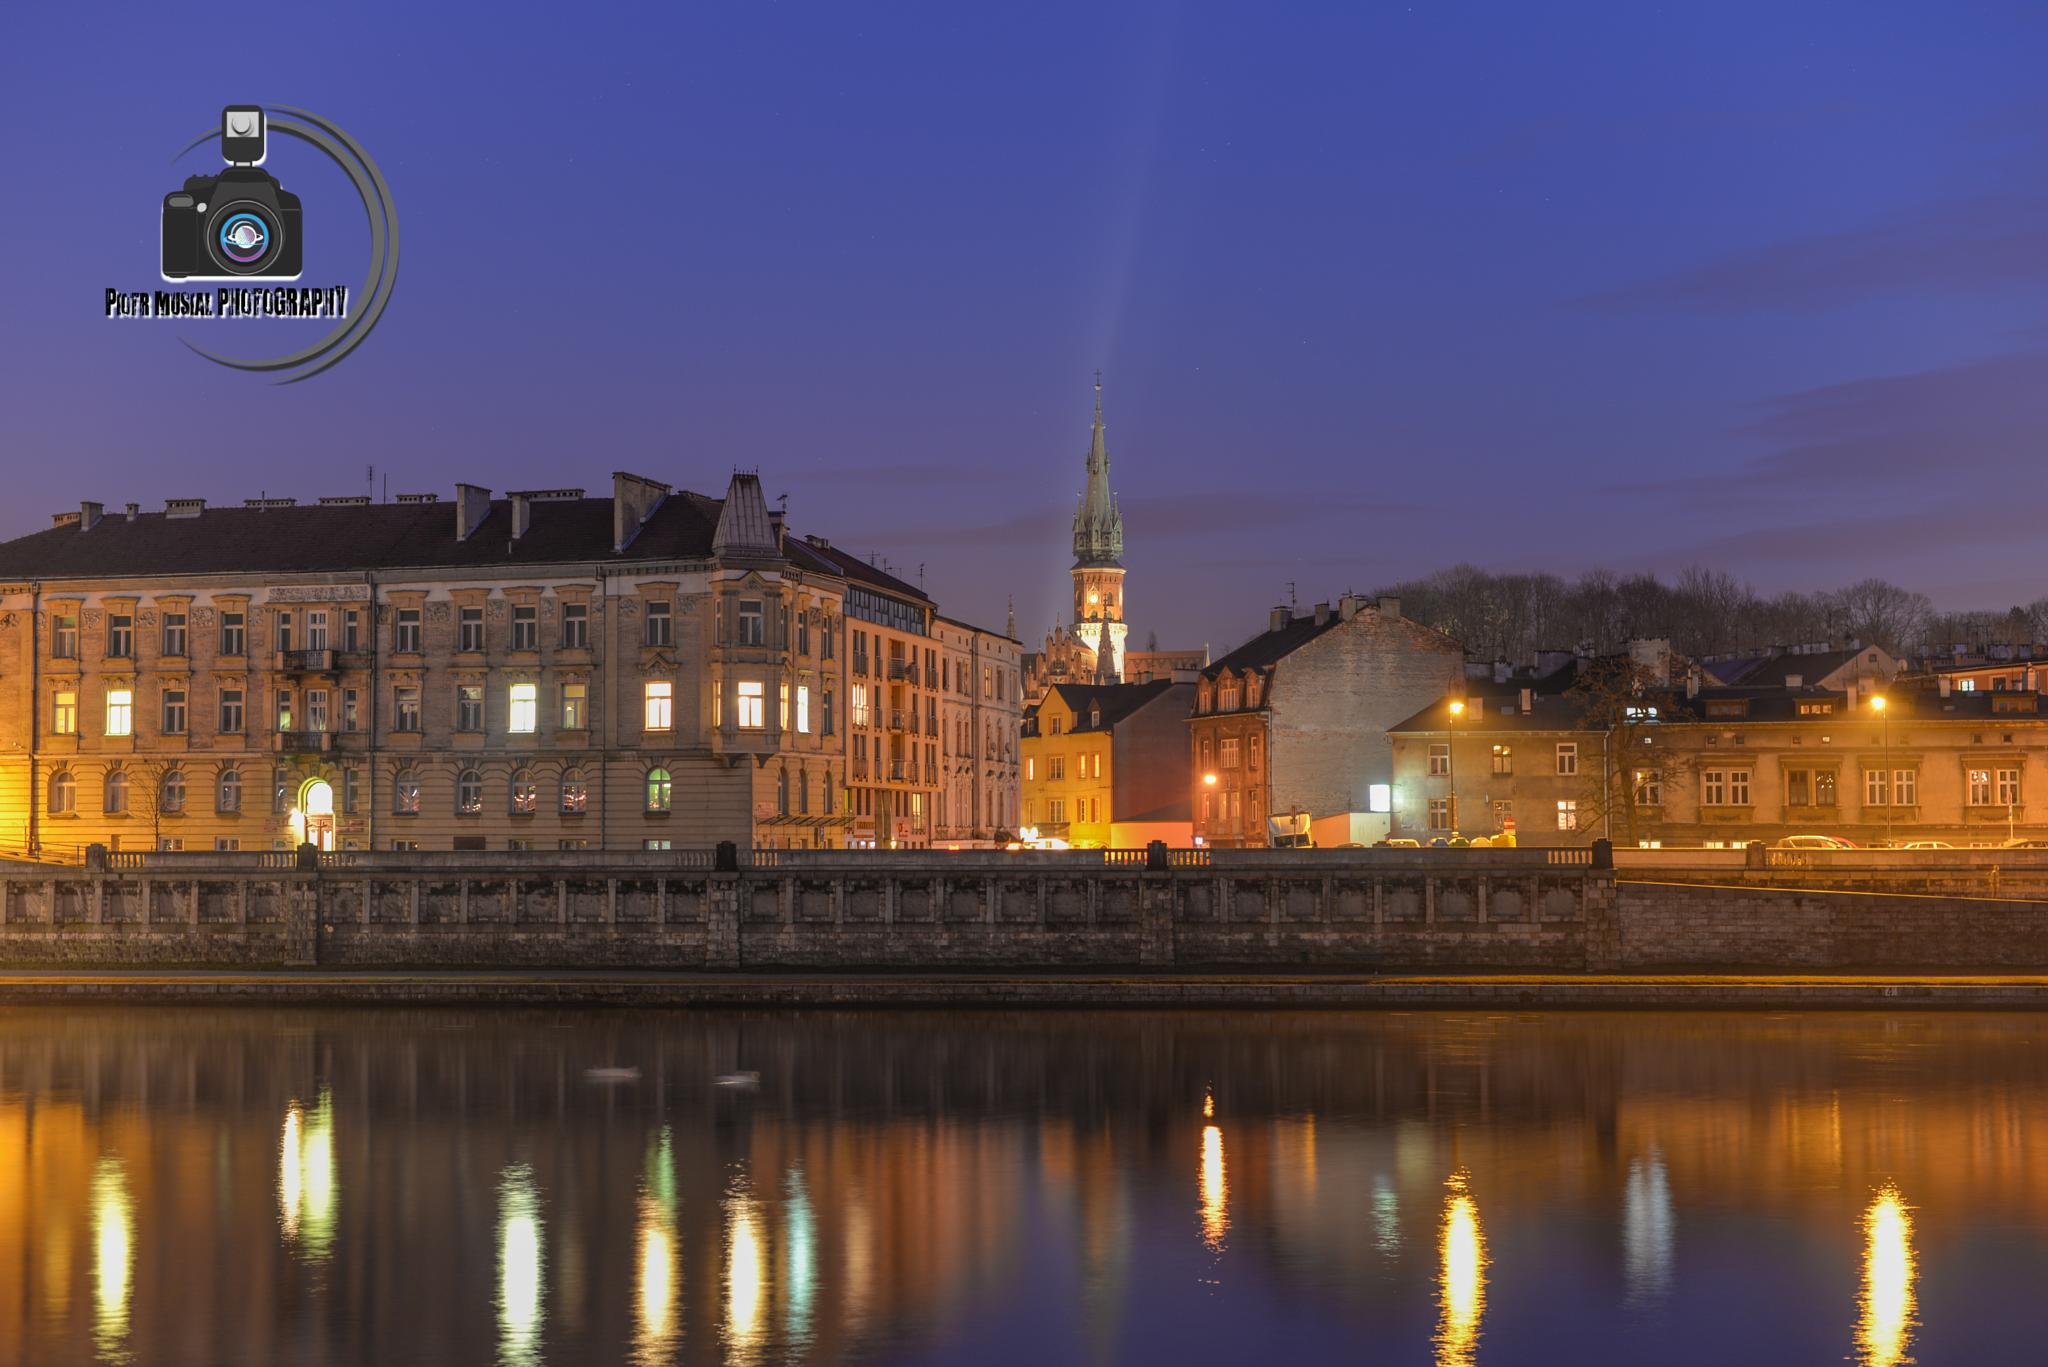 Krakow  by Piotr Musiał Photography